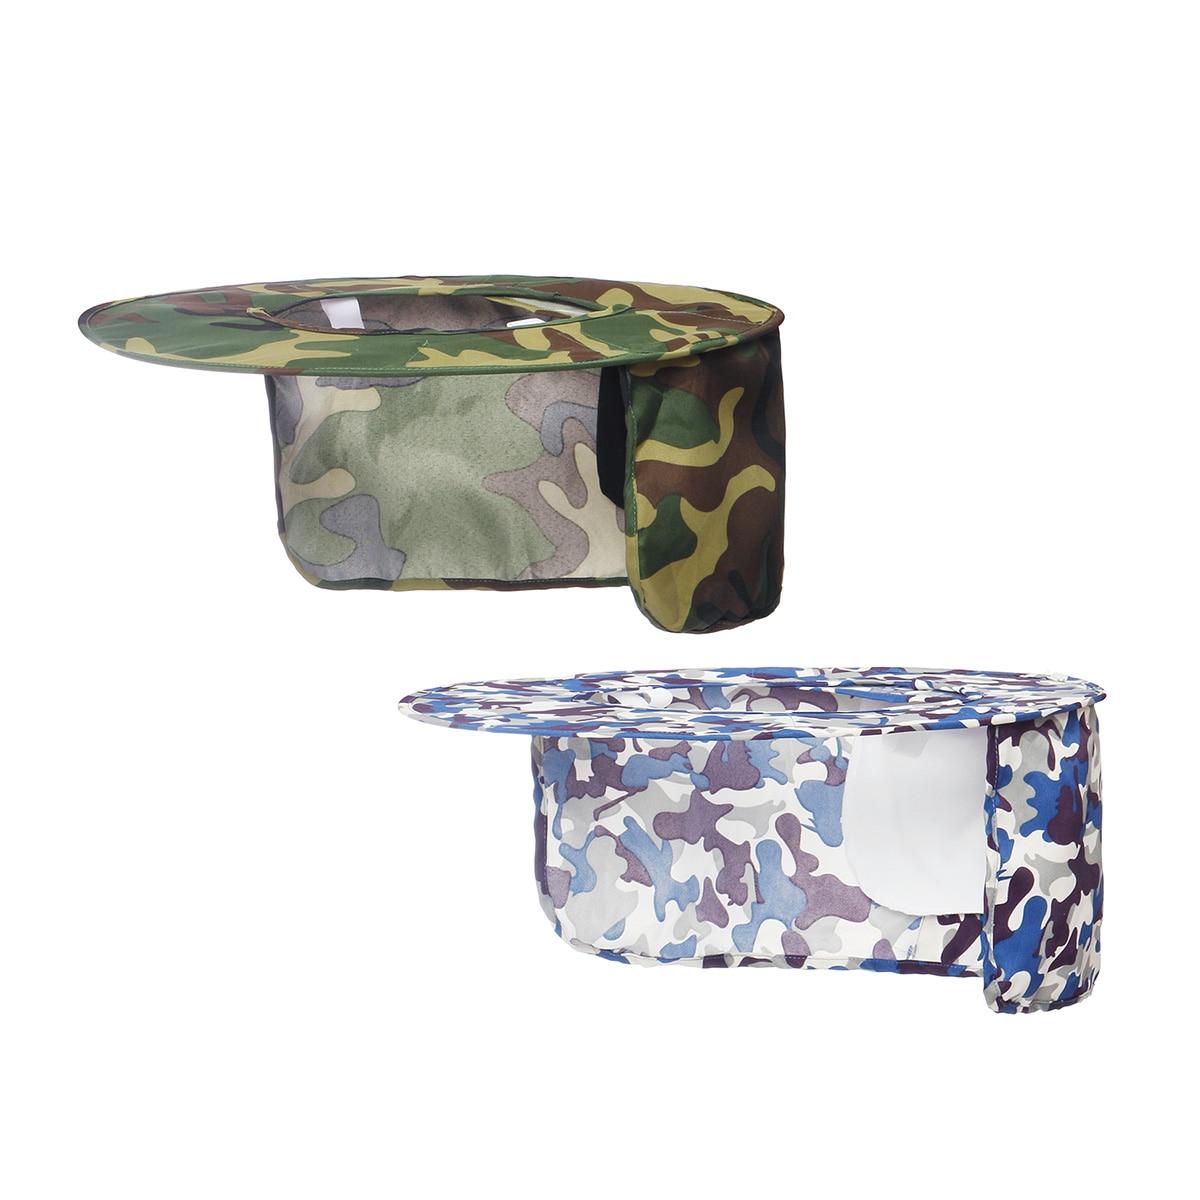 Safurance Green Camo/Blue Camo Outdoor Workplace Safety Helmets Hard Hat Cap Sun Shield Shade Head Neck Nape Protection Sunshade